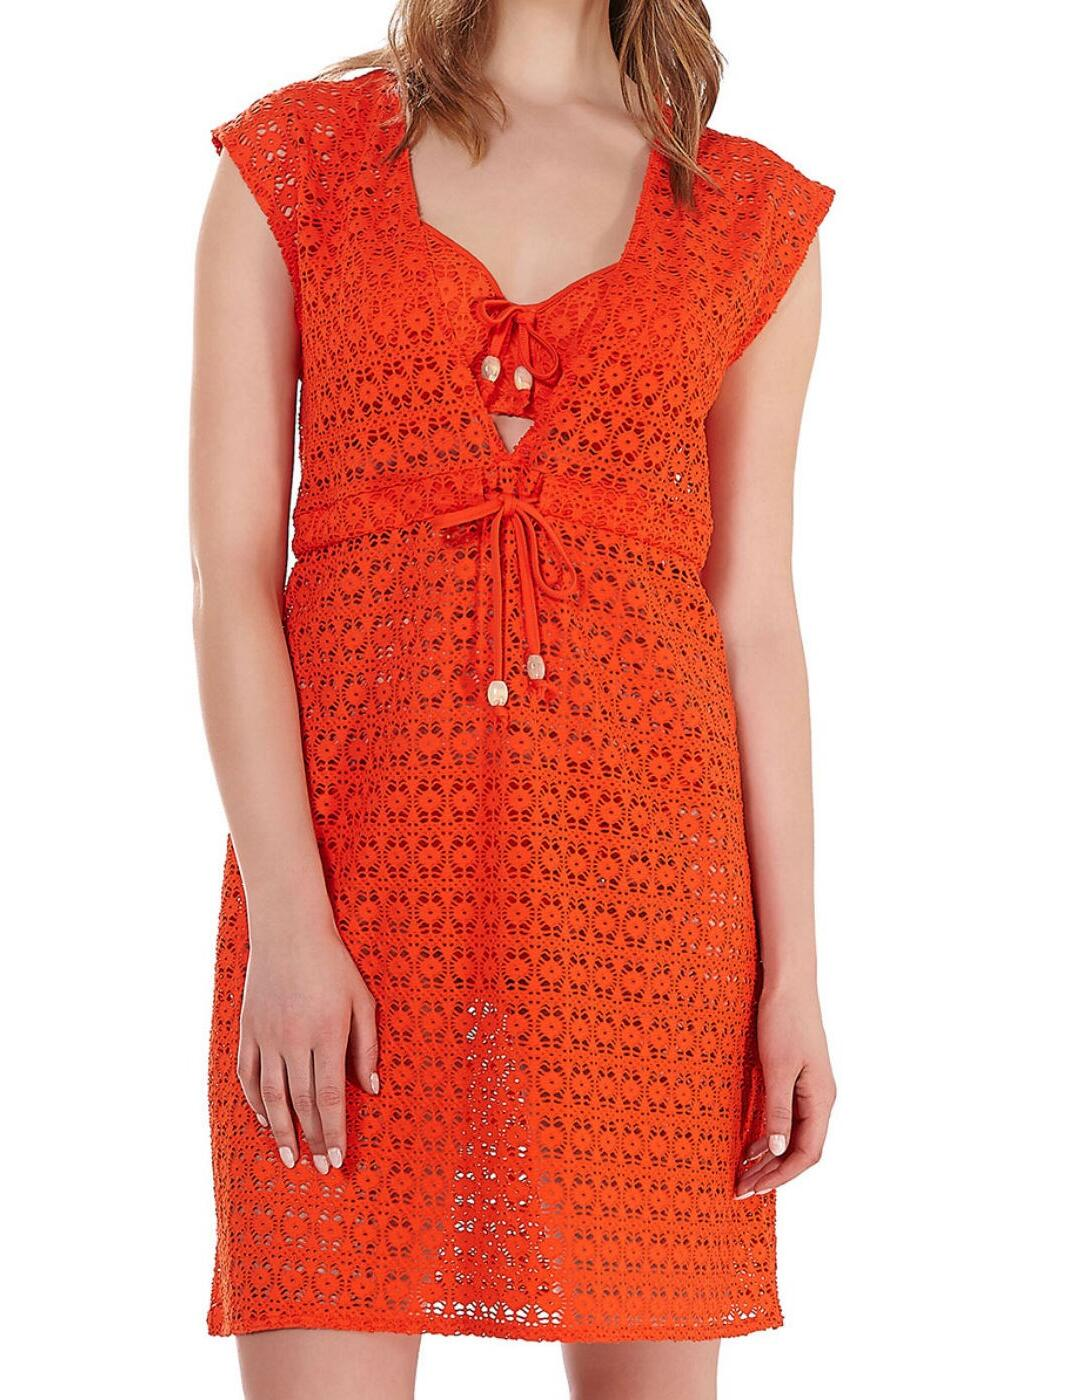 3908 Freya Spirit Beach Tunic Dress - 3908 Flame